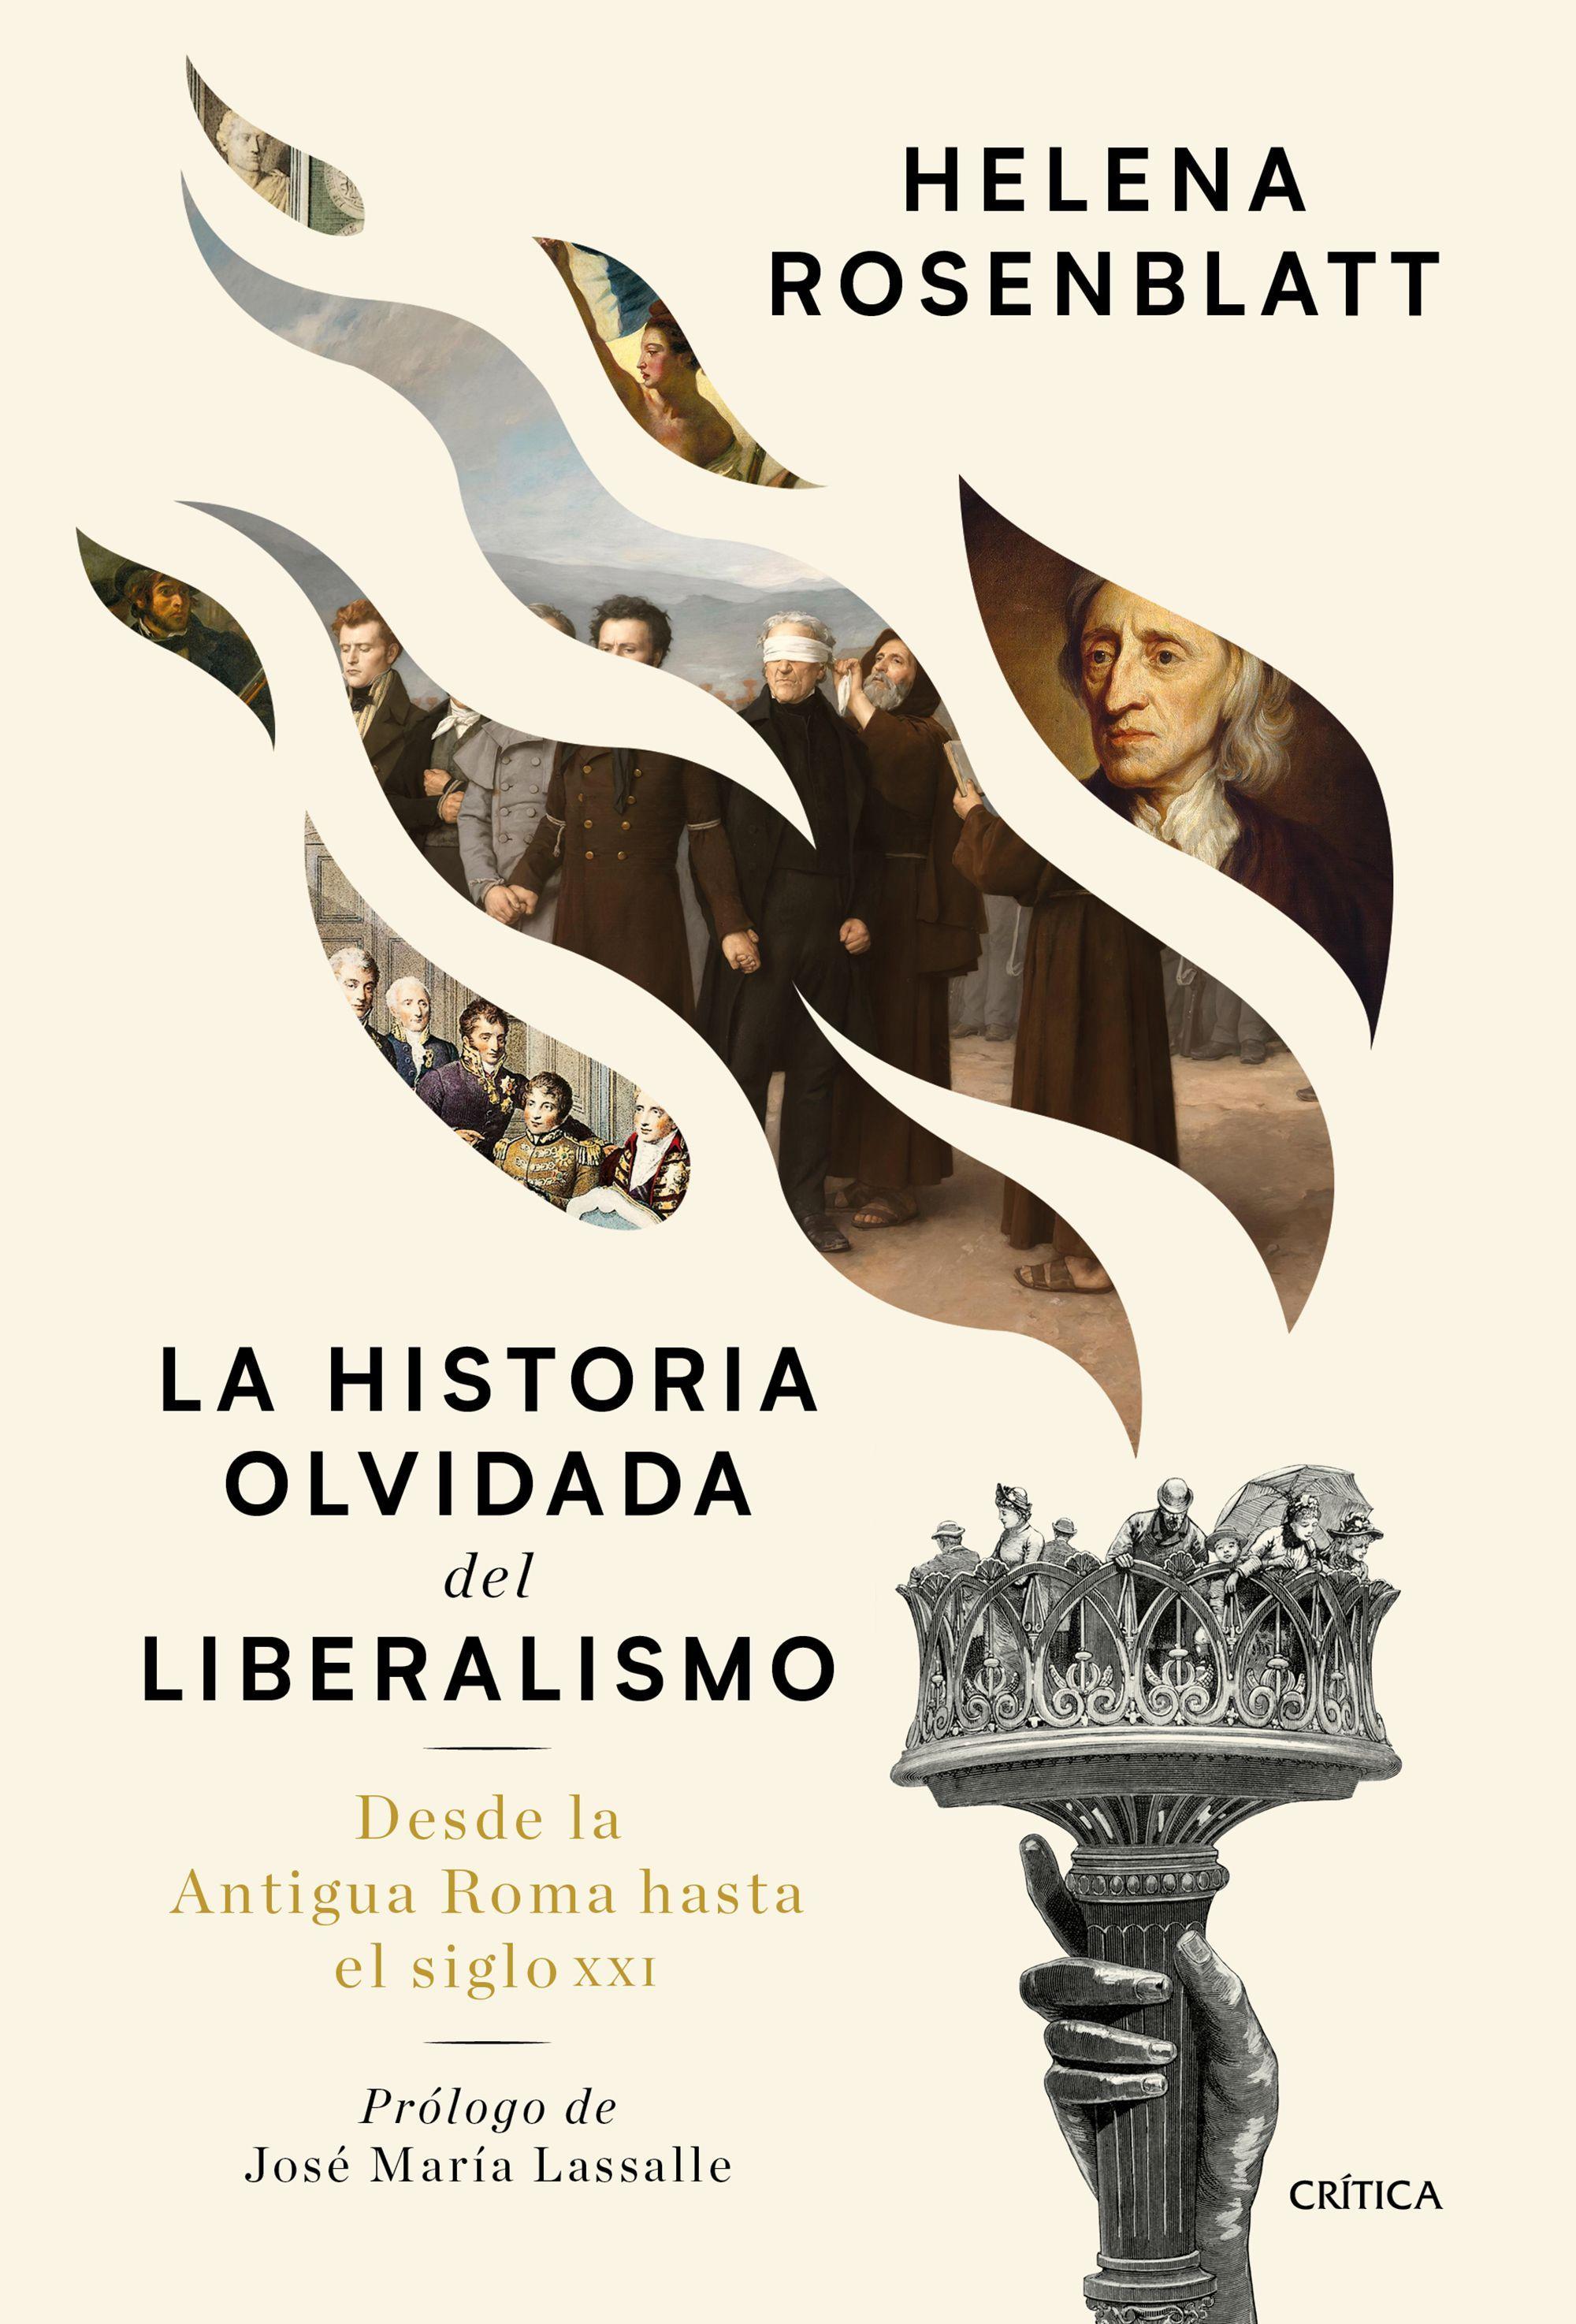 HISTORIA OLVIDADA DEL LIBERALISMO